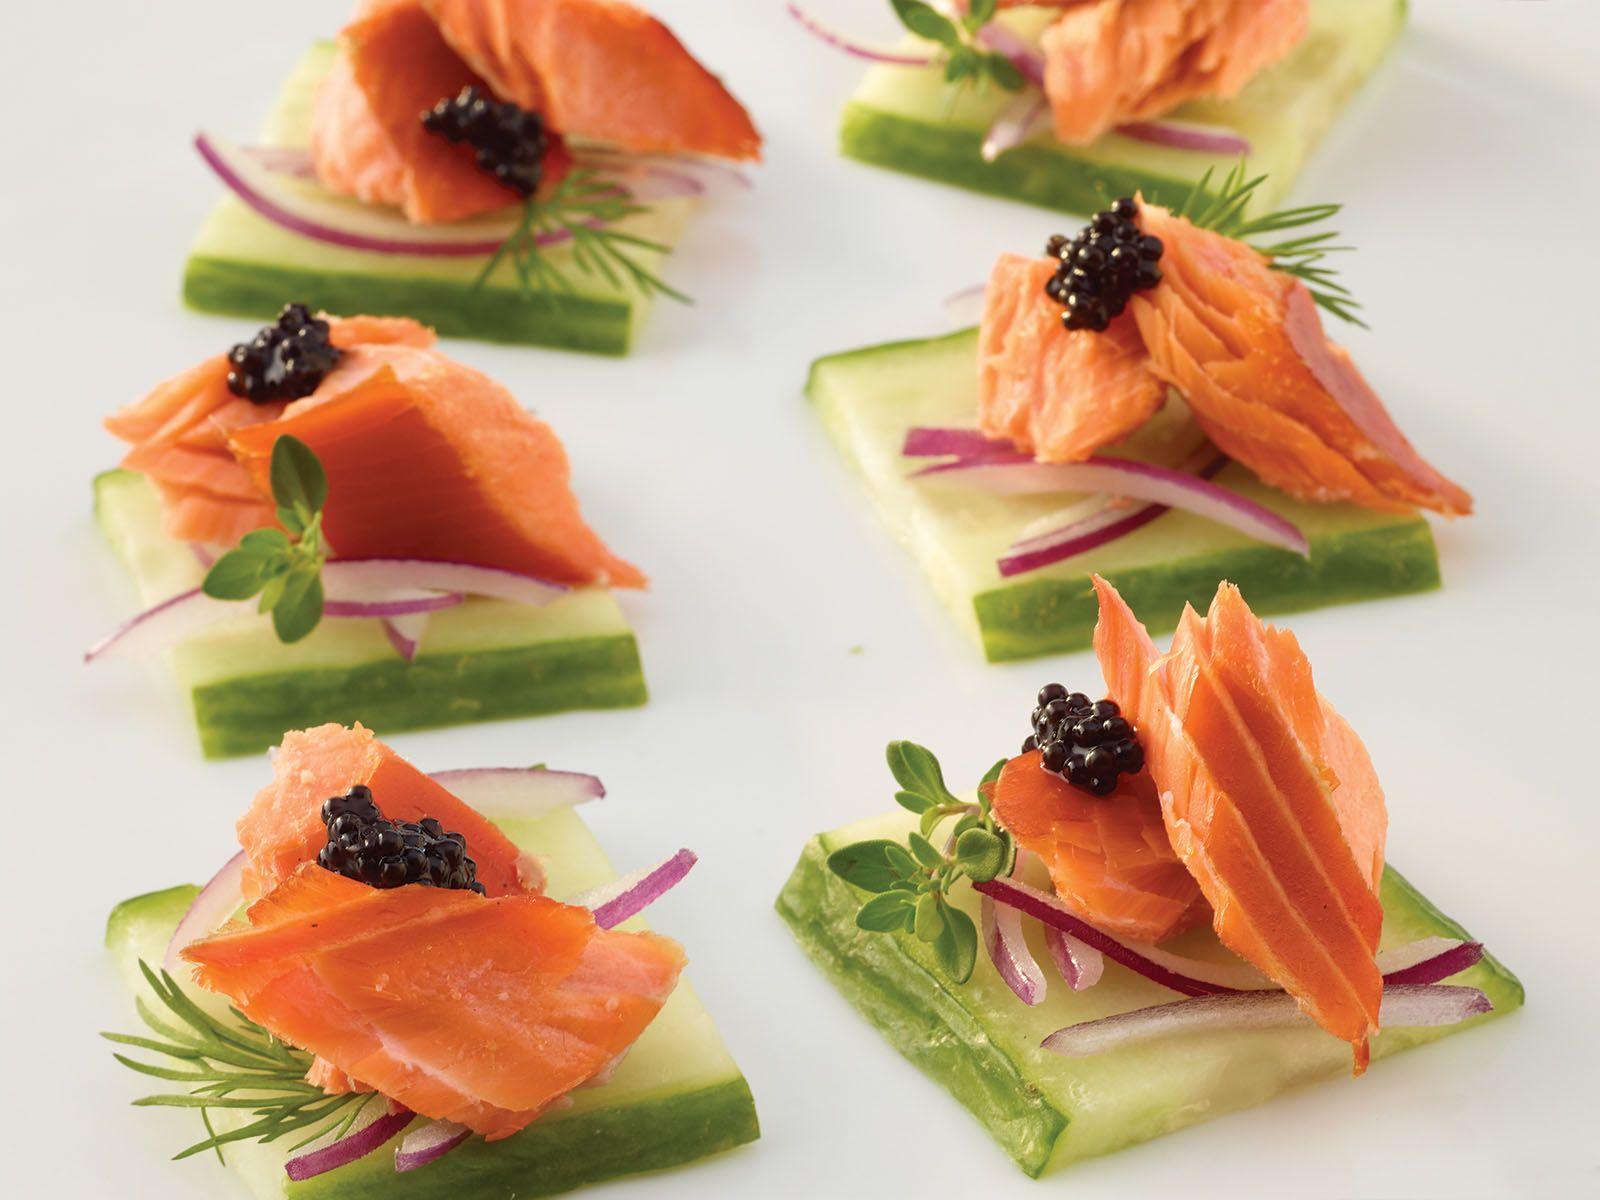 Trident Seafoods Smoked Sockeye Salmon - Traditional 4 oz